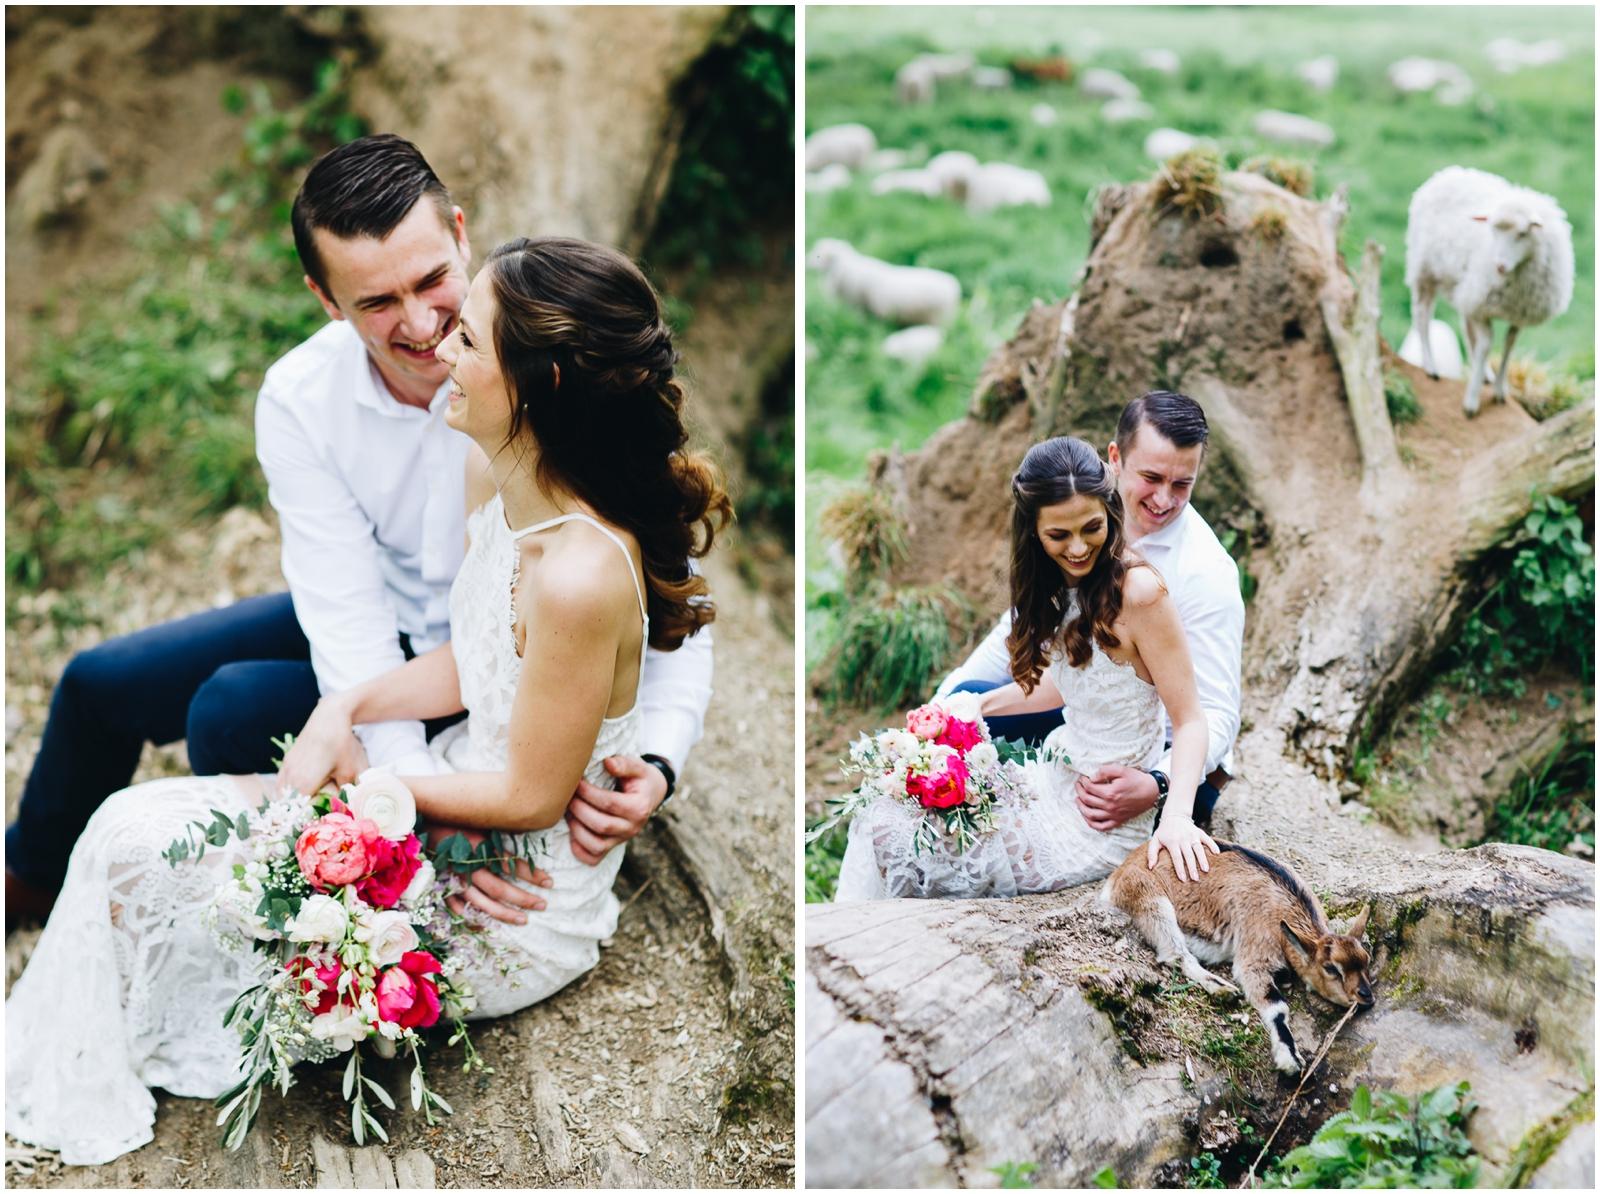 LE HAI LINH Photography-Hochzeitsfotograf-Bohohochzeit-_0056.jpg